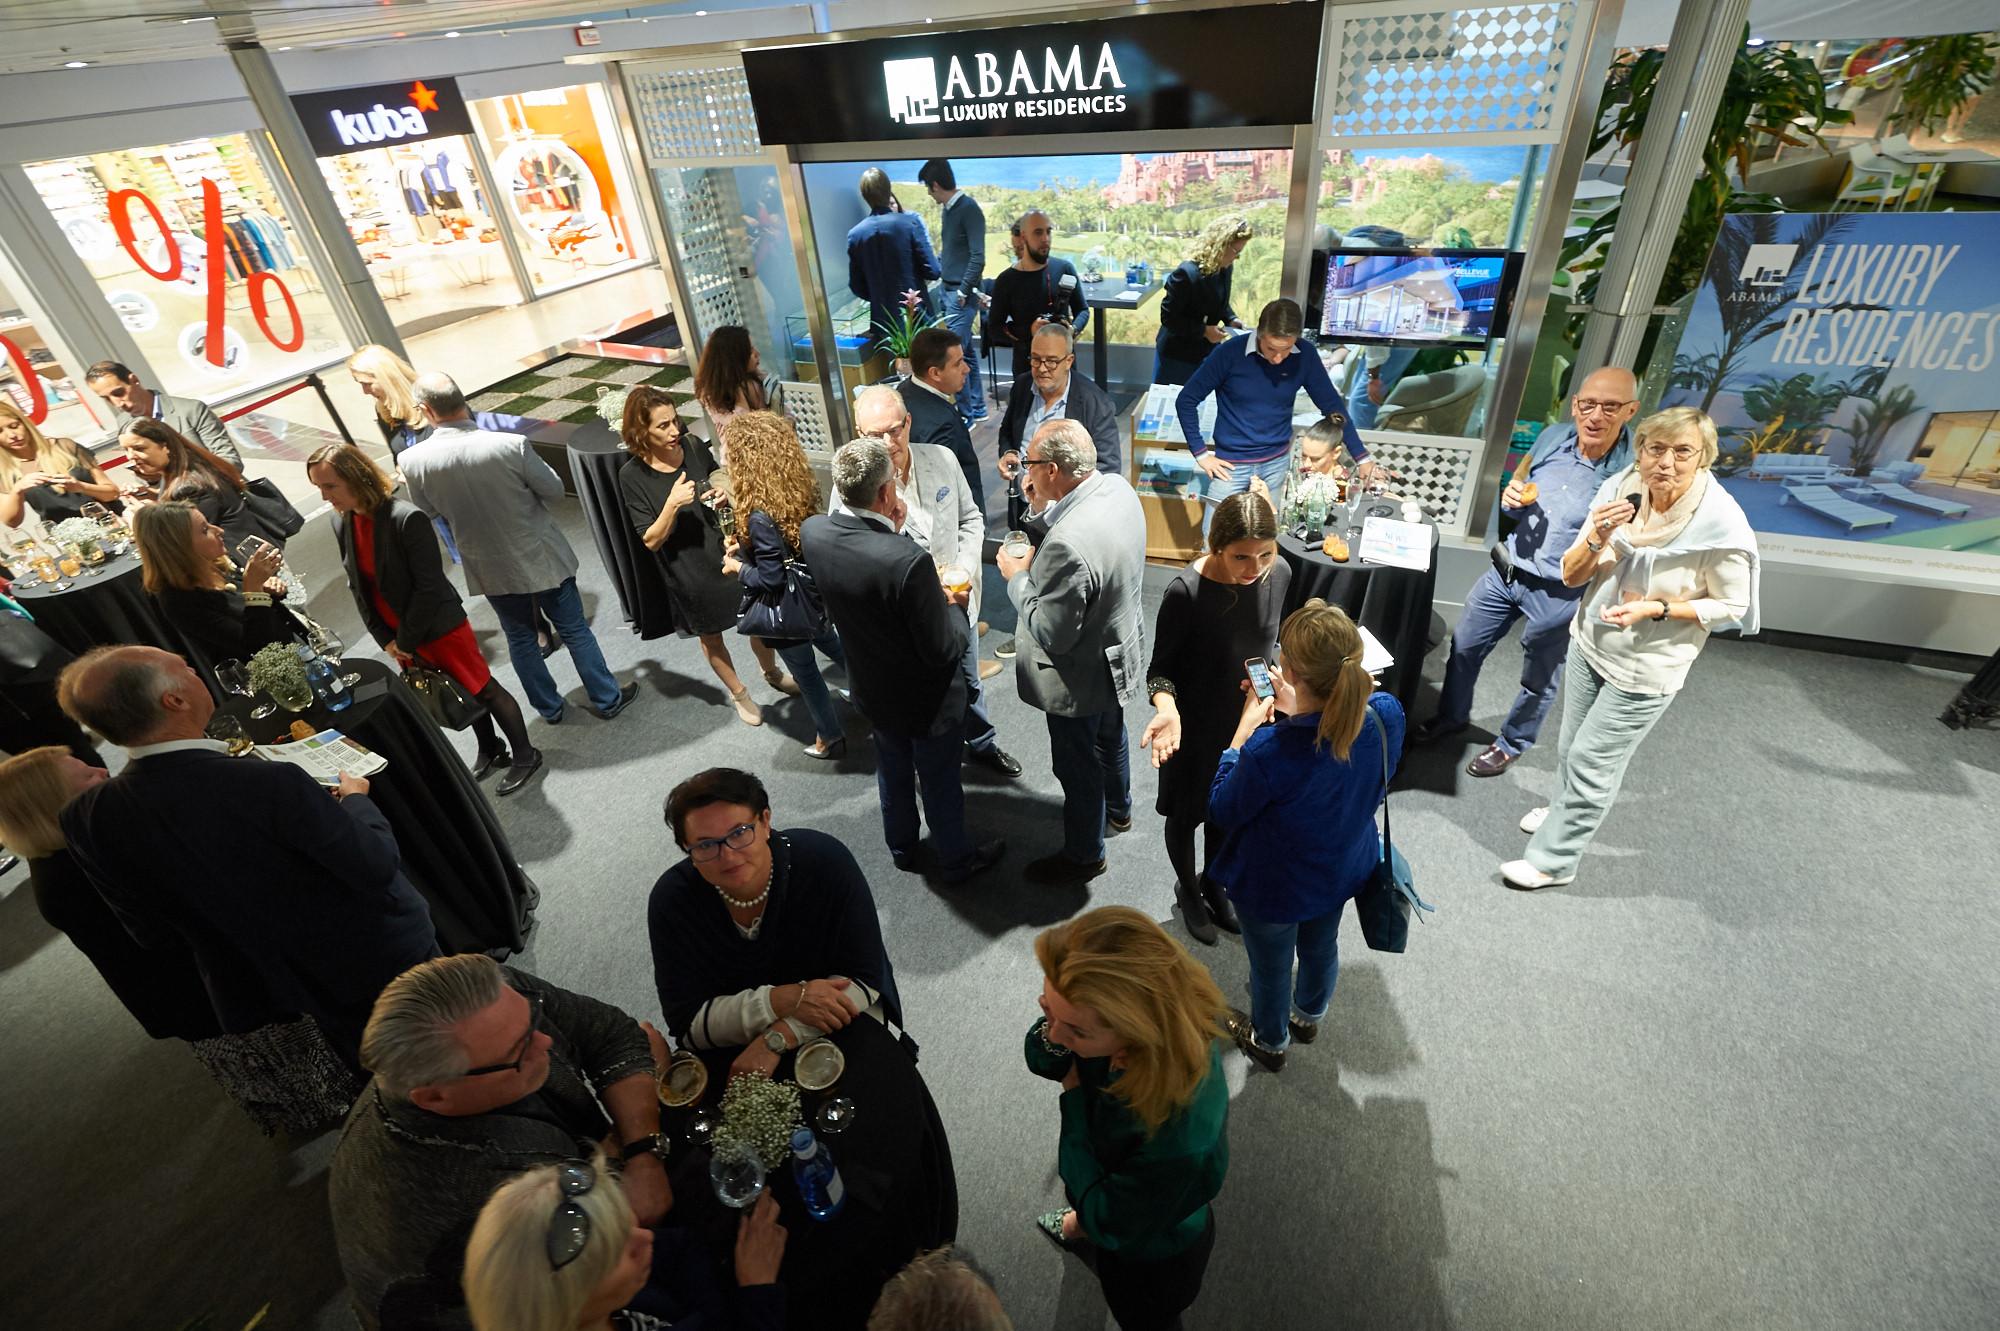 Moadiario Abama Luxury Residences Sales Point